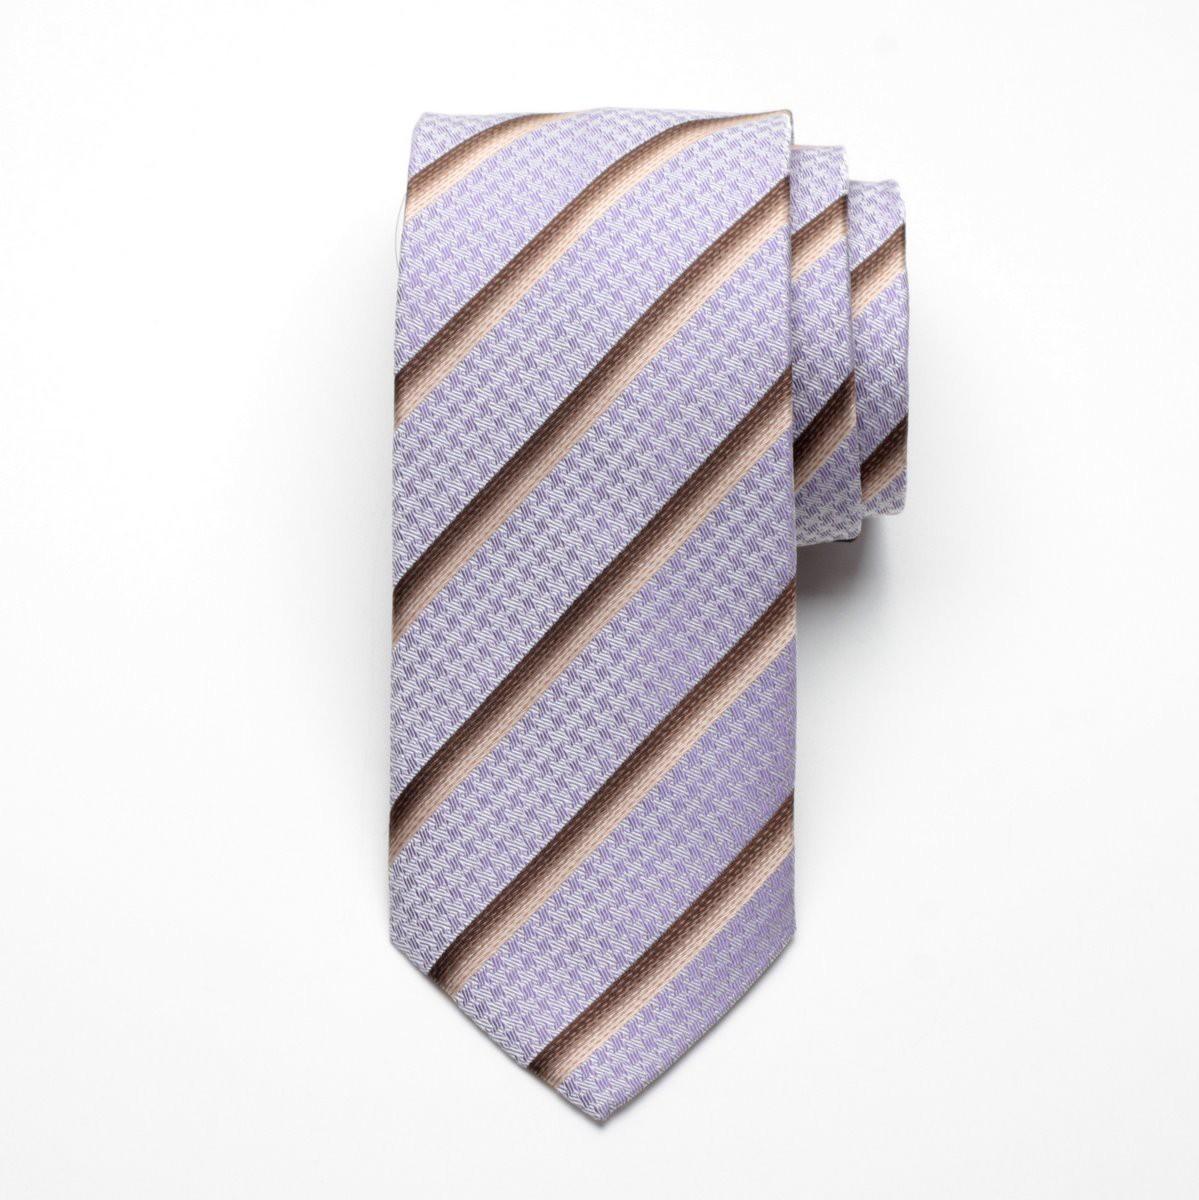 Krawat jedwabny Fine Selection (wzór 91)